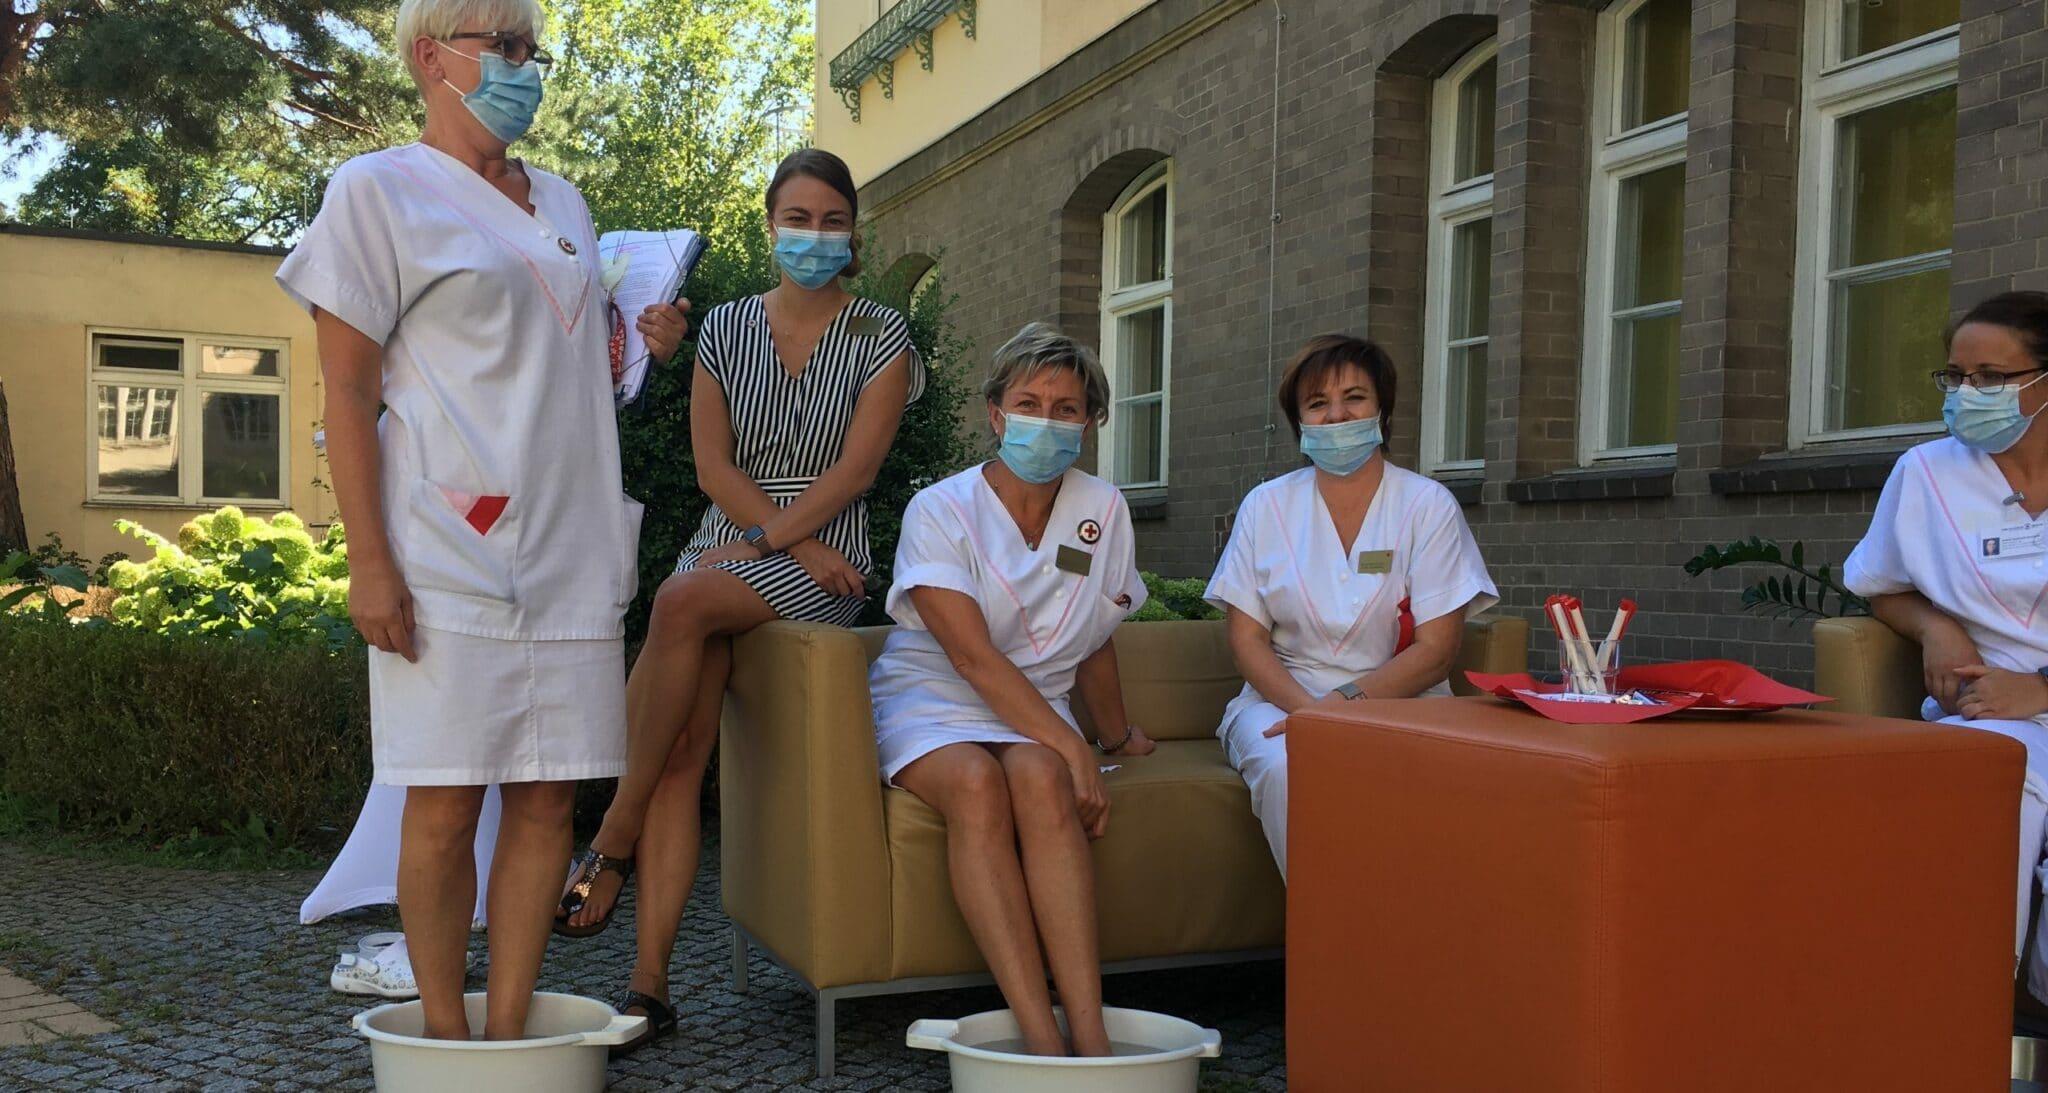 Bewerber Speeddating bei den DRK Kliniken Berlin Köpenick